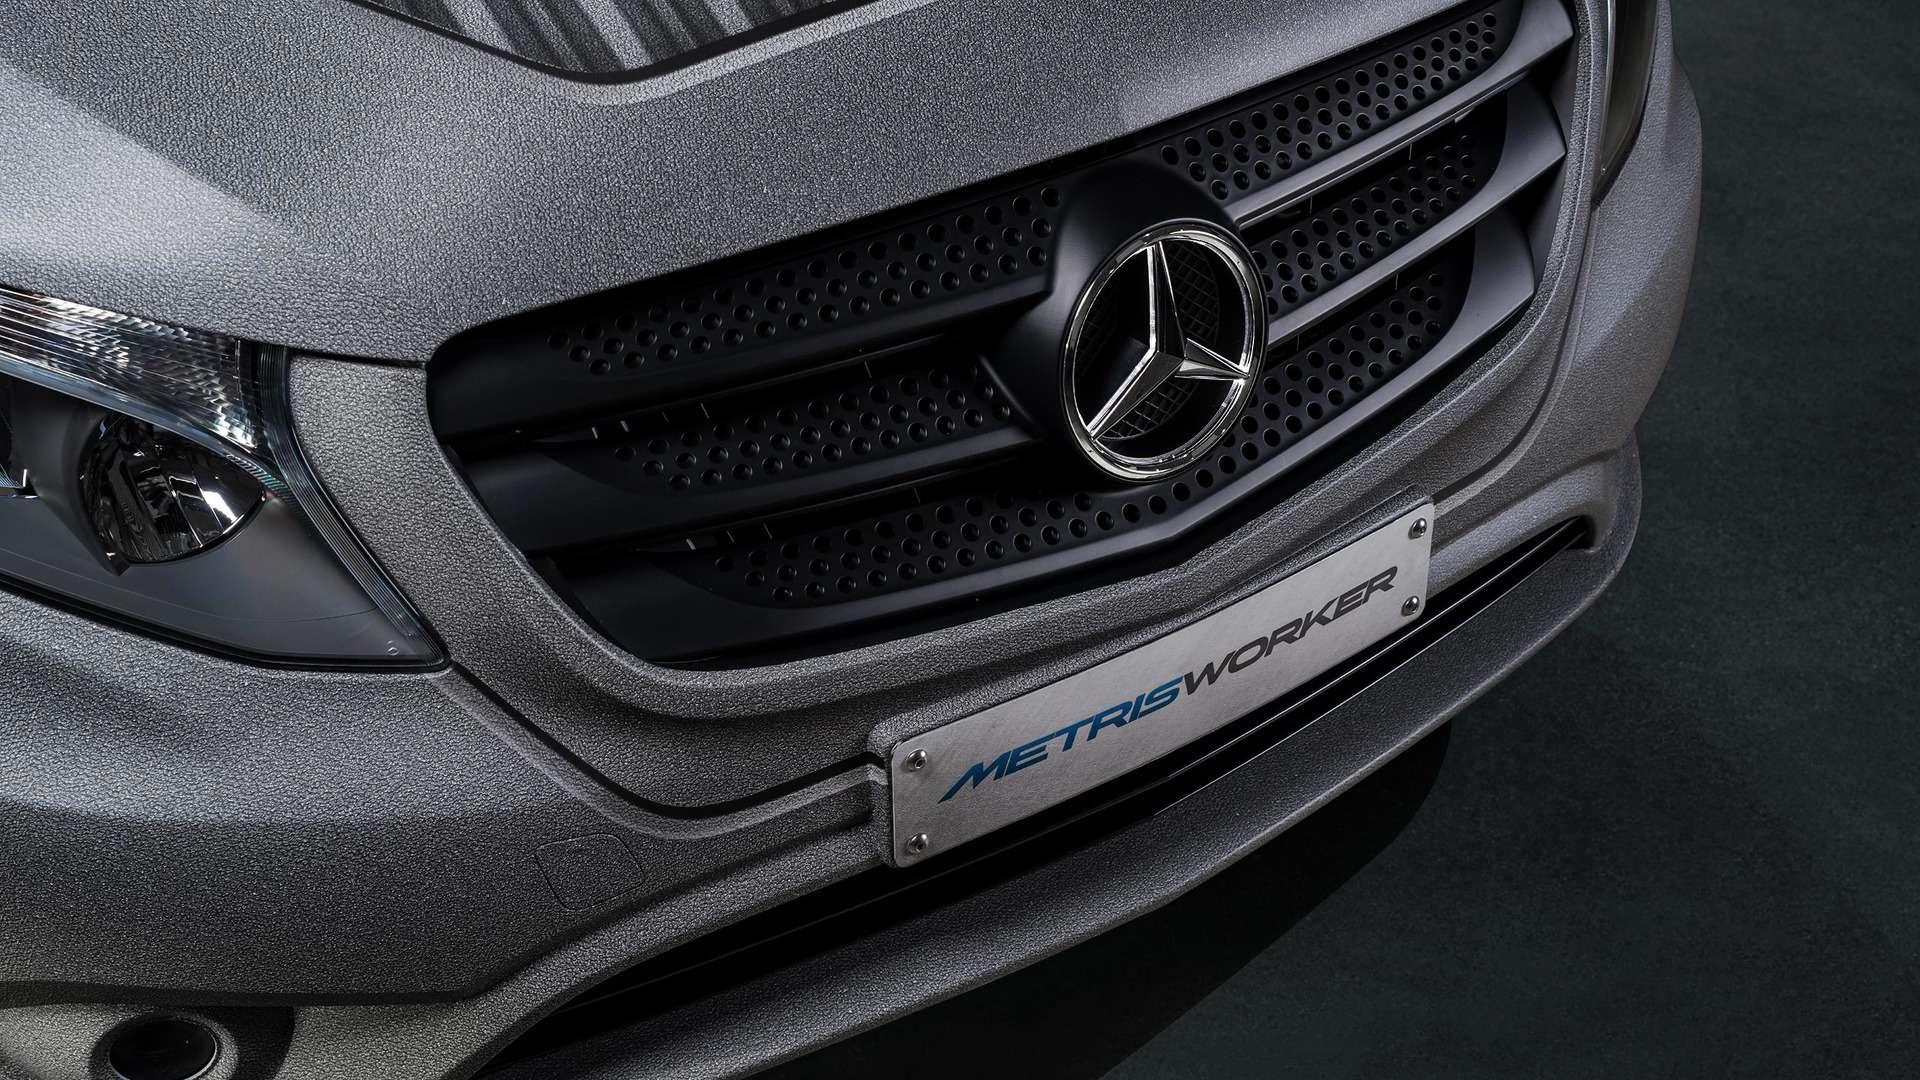 Чемодан сручкой: Mercedes-Benz Vito превратили вмечту автомеханика— фото 705796